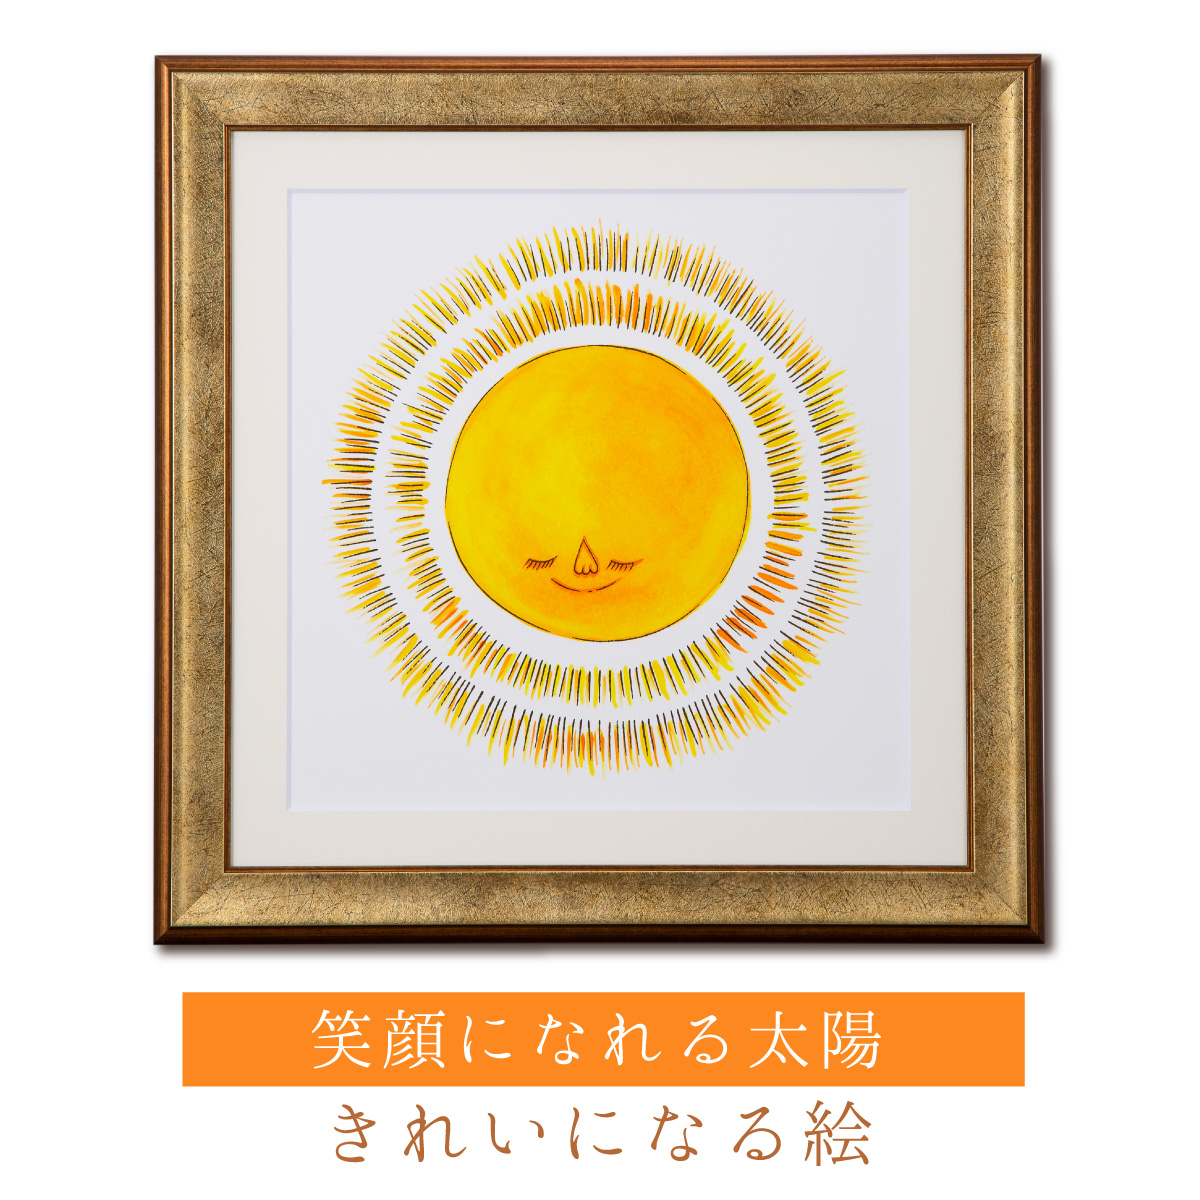 RIEの『きれいになる絵』 ≫ エンジェルナンバーが散りばめられた開運アート!大きな太陽が笑顔を招く!